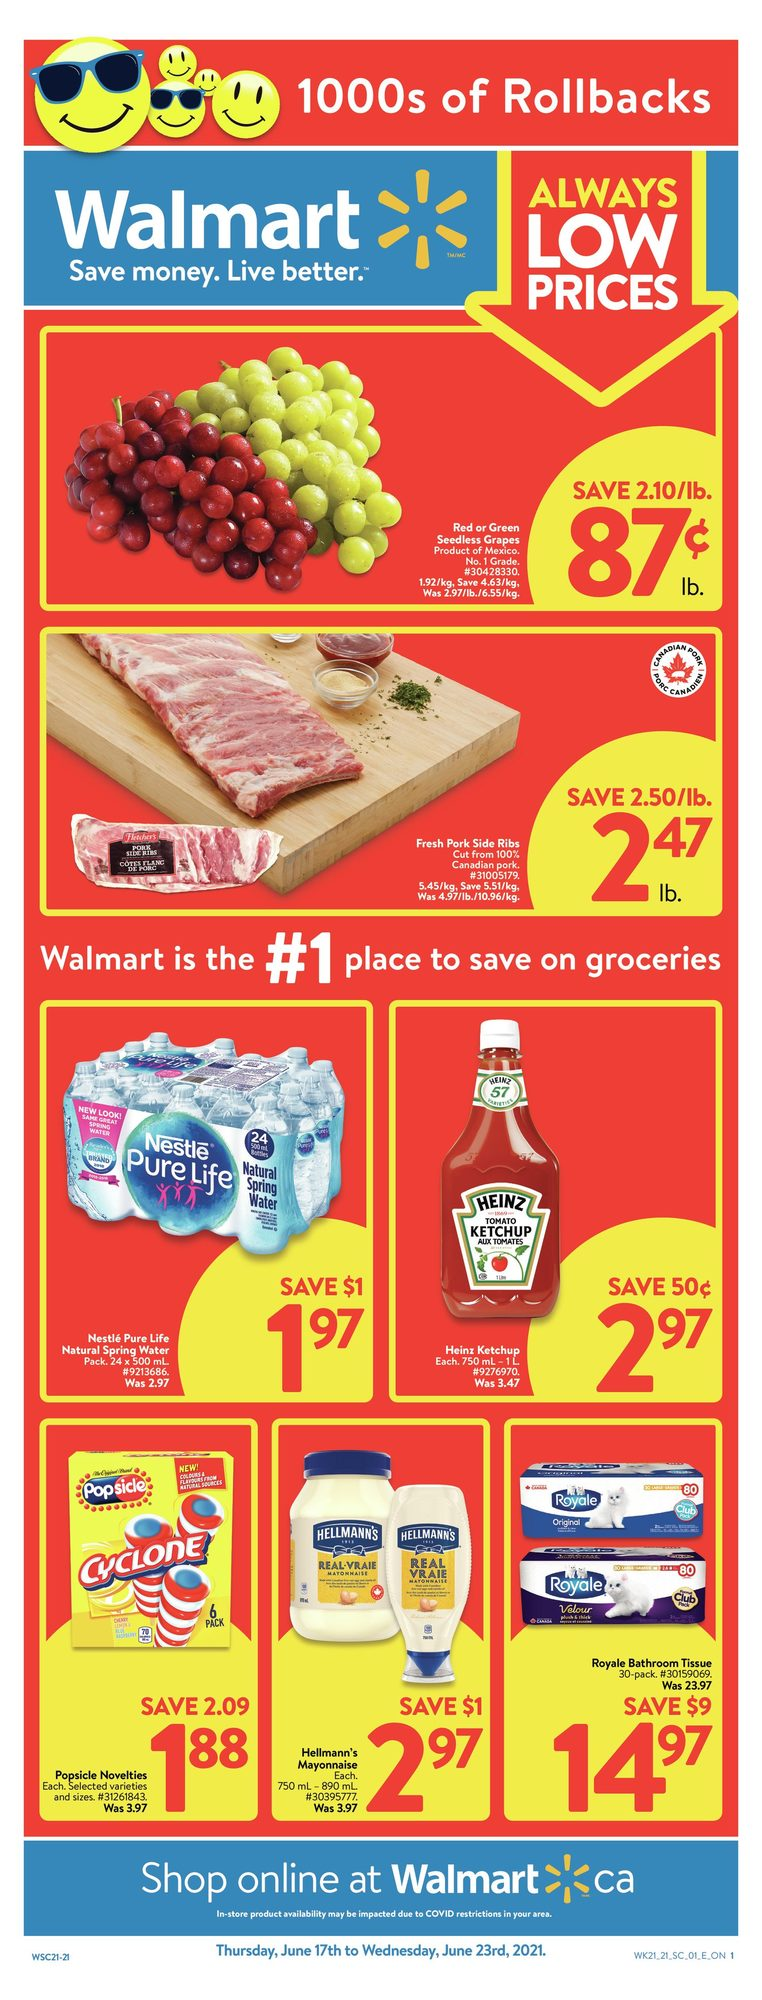 Walmart - Weekly Flyer Specials